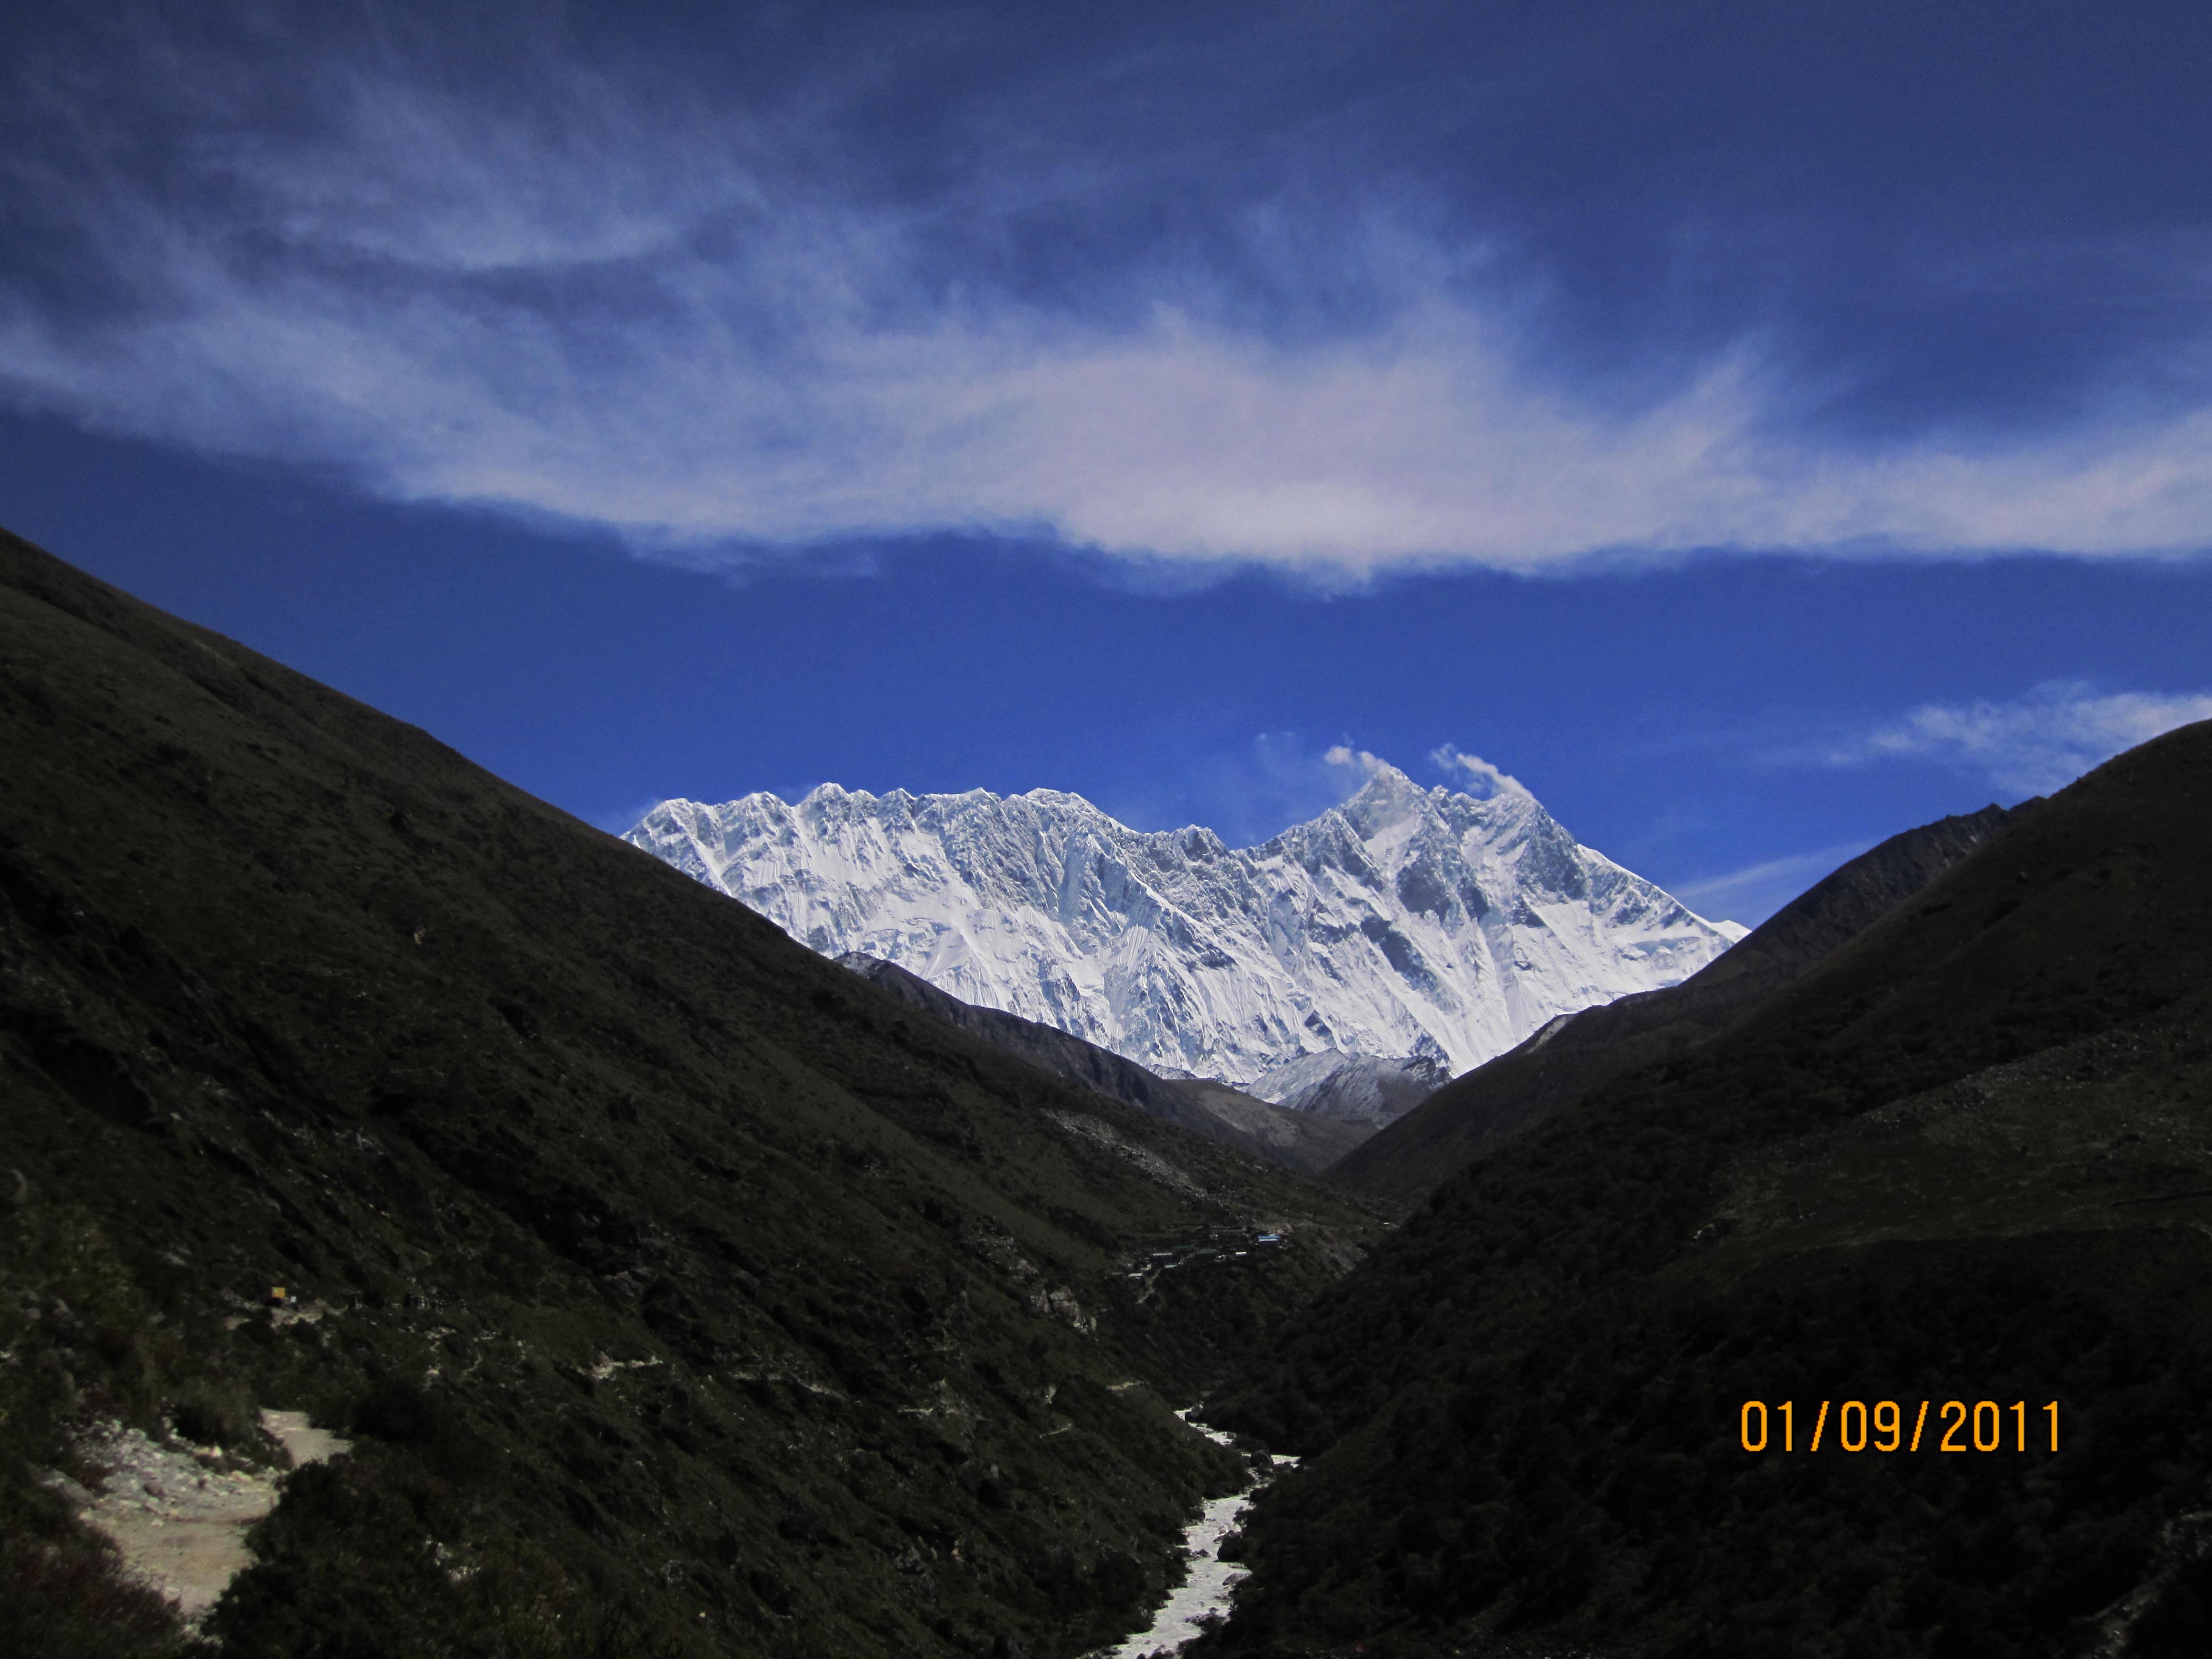 Khumbu valley trekking -  Mount Everest